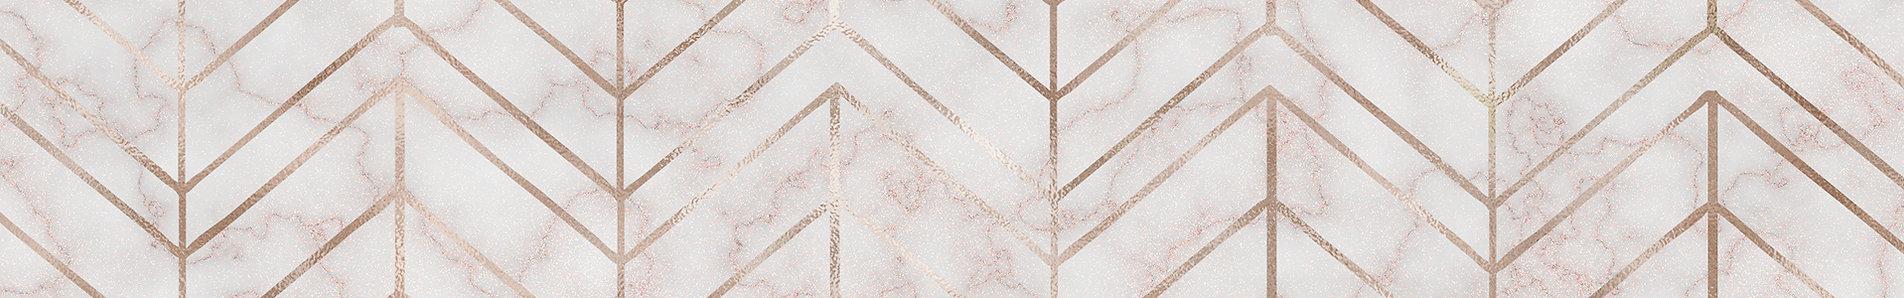 background-strip-LARGE-SIZE-marble.jpg